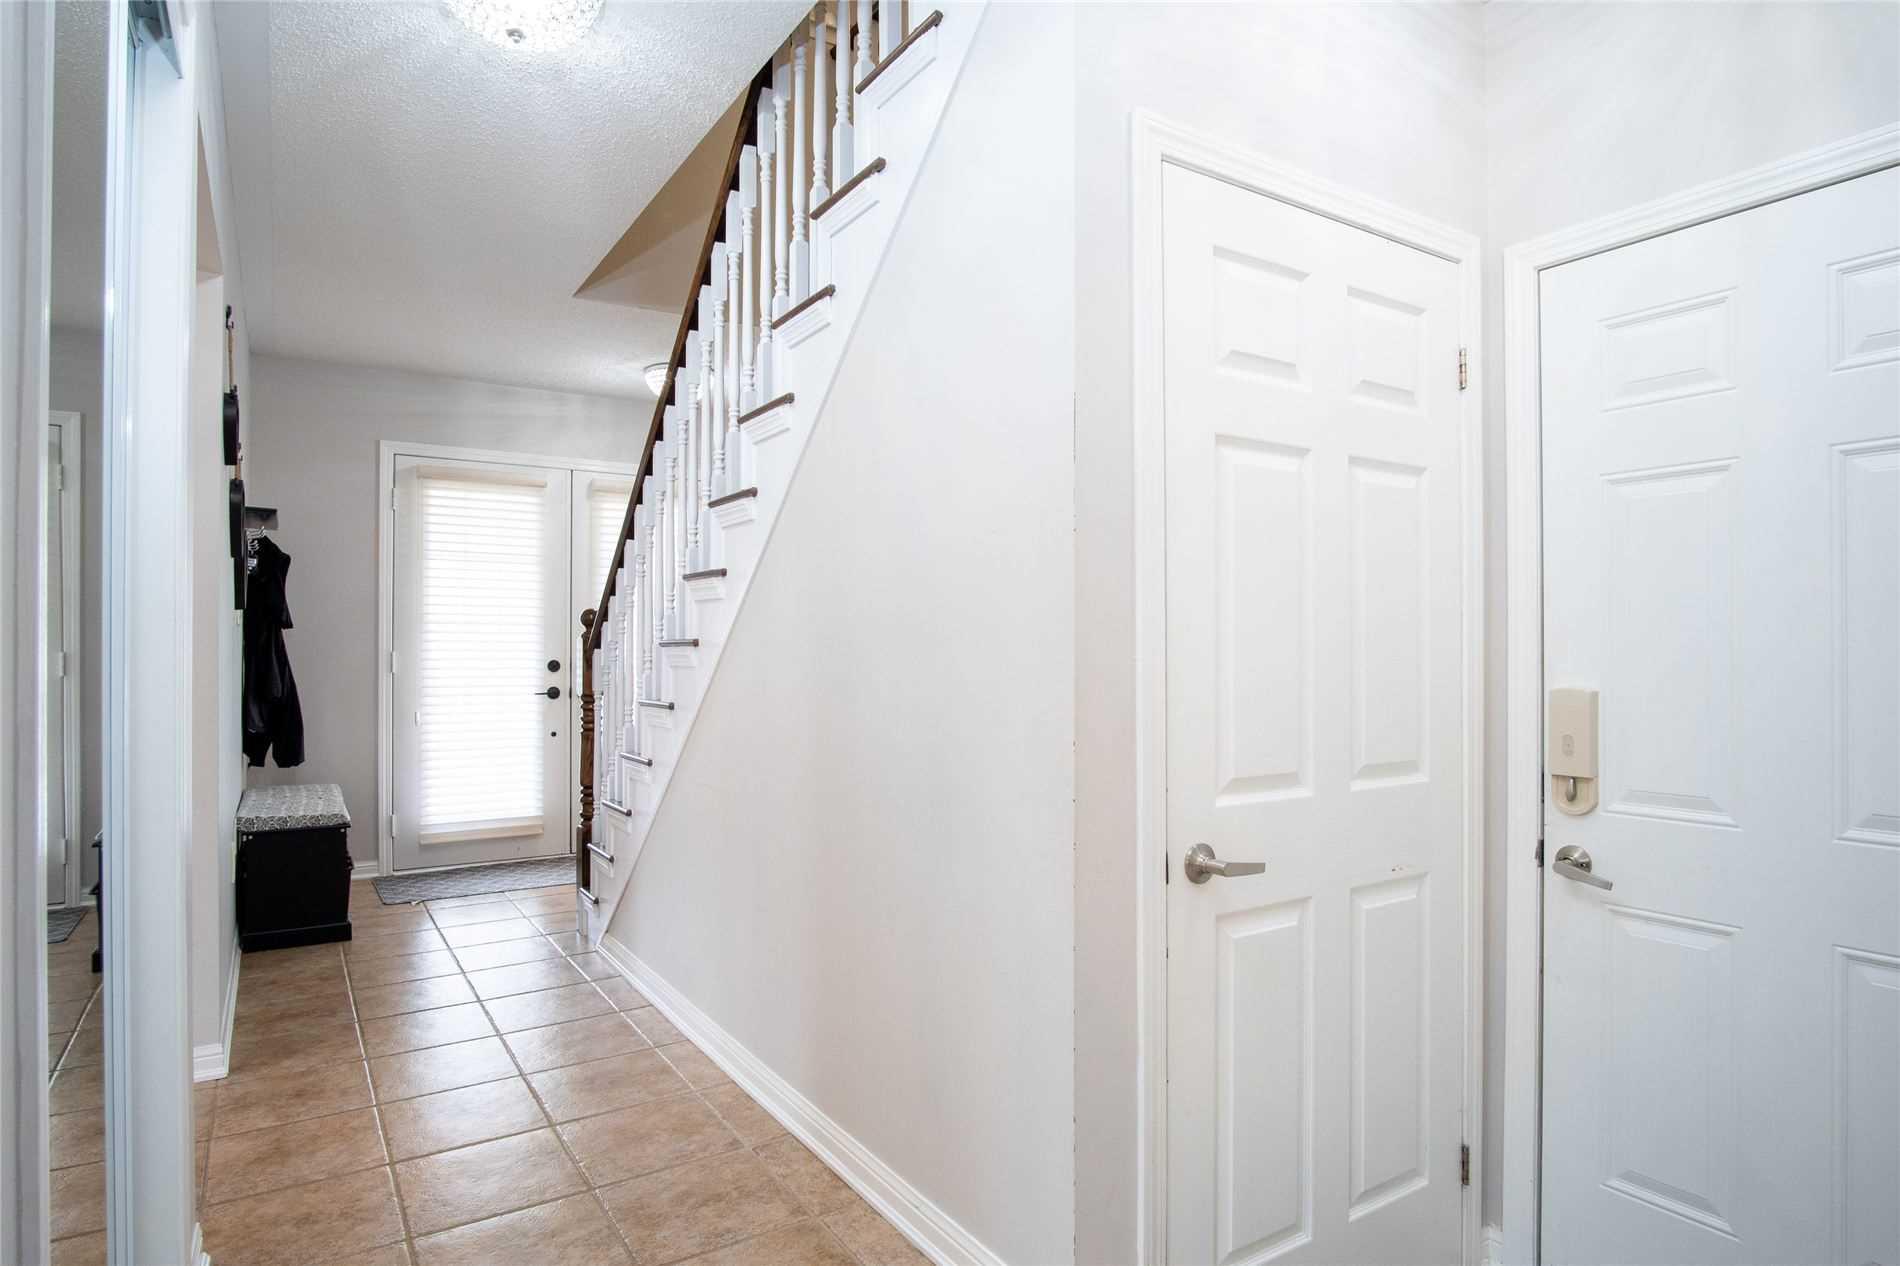 827 Biggar Hts - Coates Detached for sale, 4 Bedrooms (W5400280) - #15